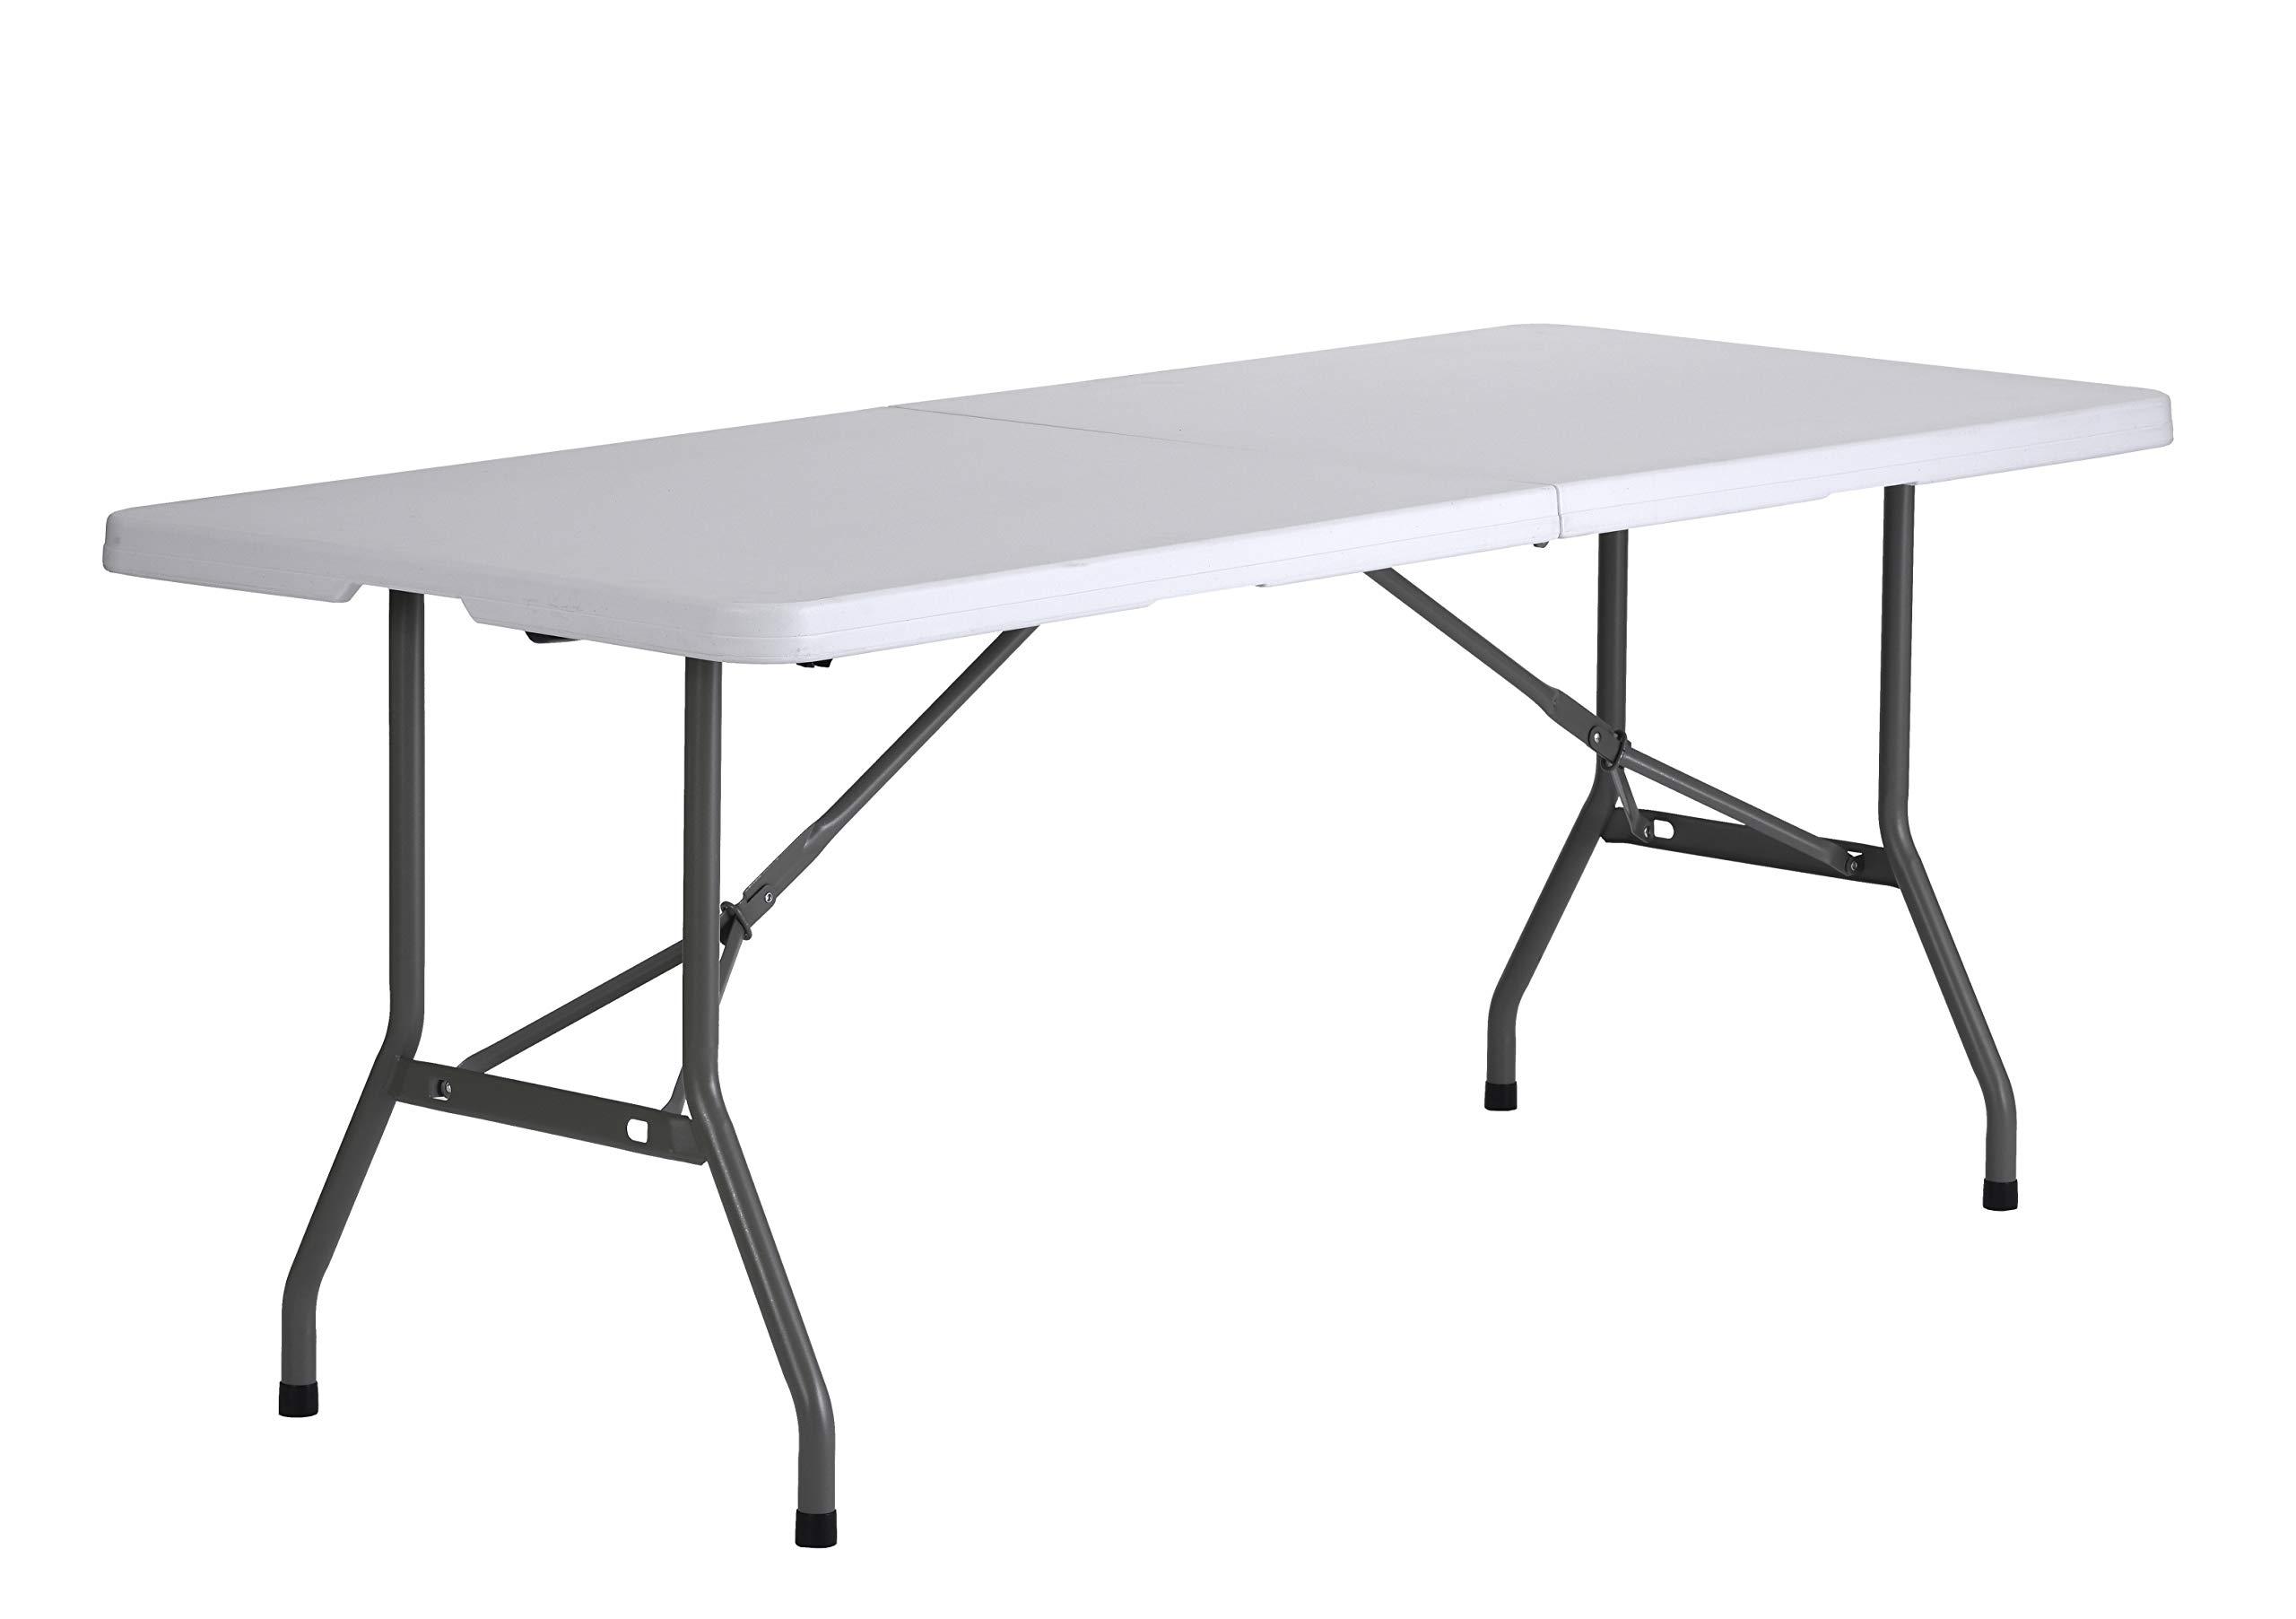 Sandusky Lee FPT7230-WV2 Commercial Fold in Half Utility Table, 6', White, 29'' Height, 72'' Width, 30'' Length by Sandusky (Image #2)